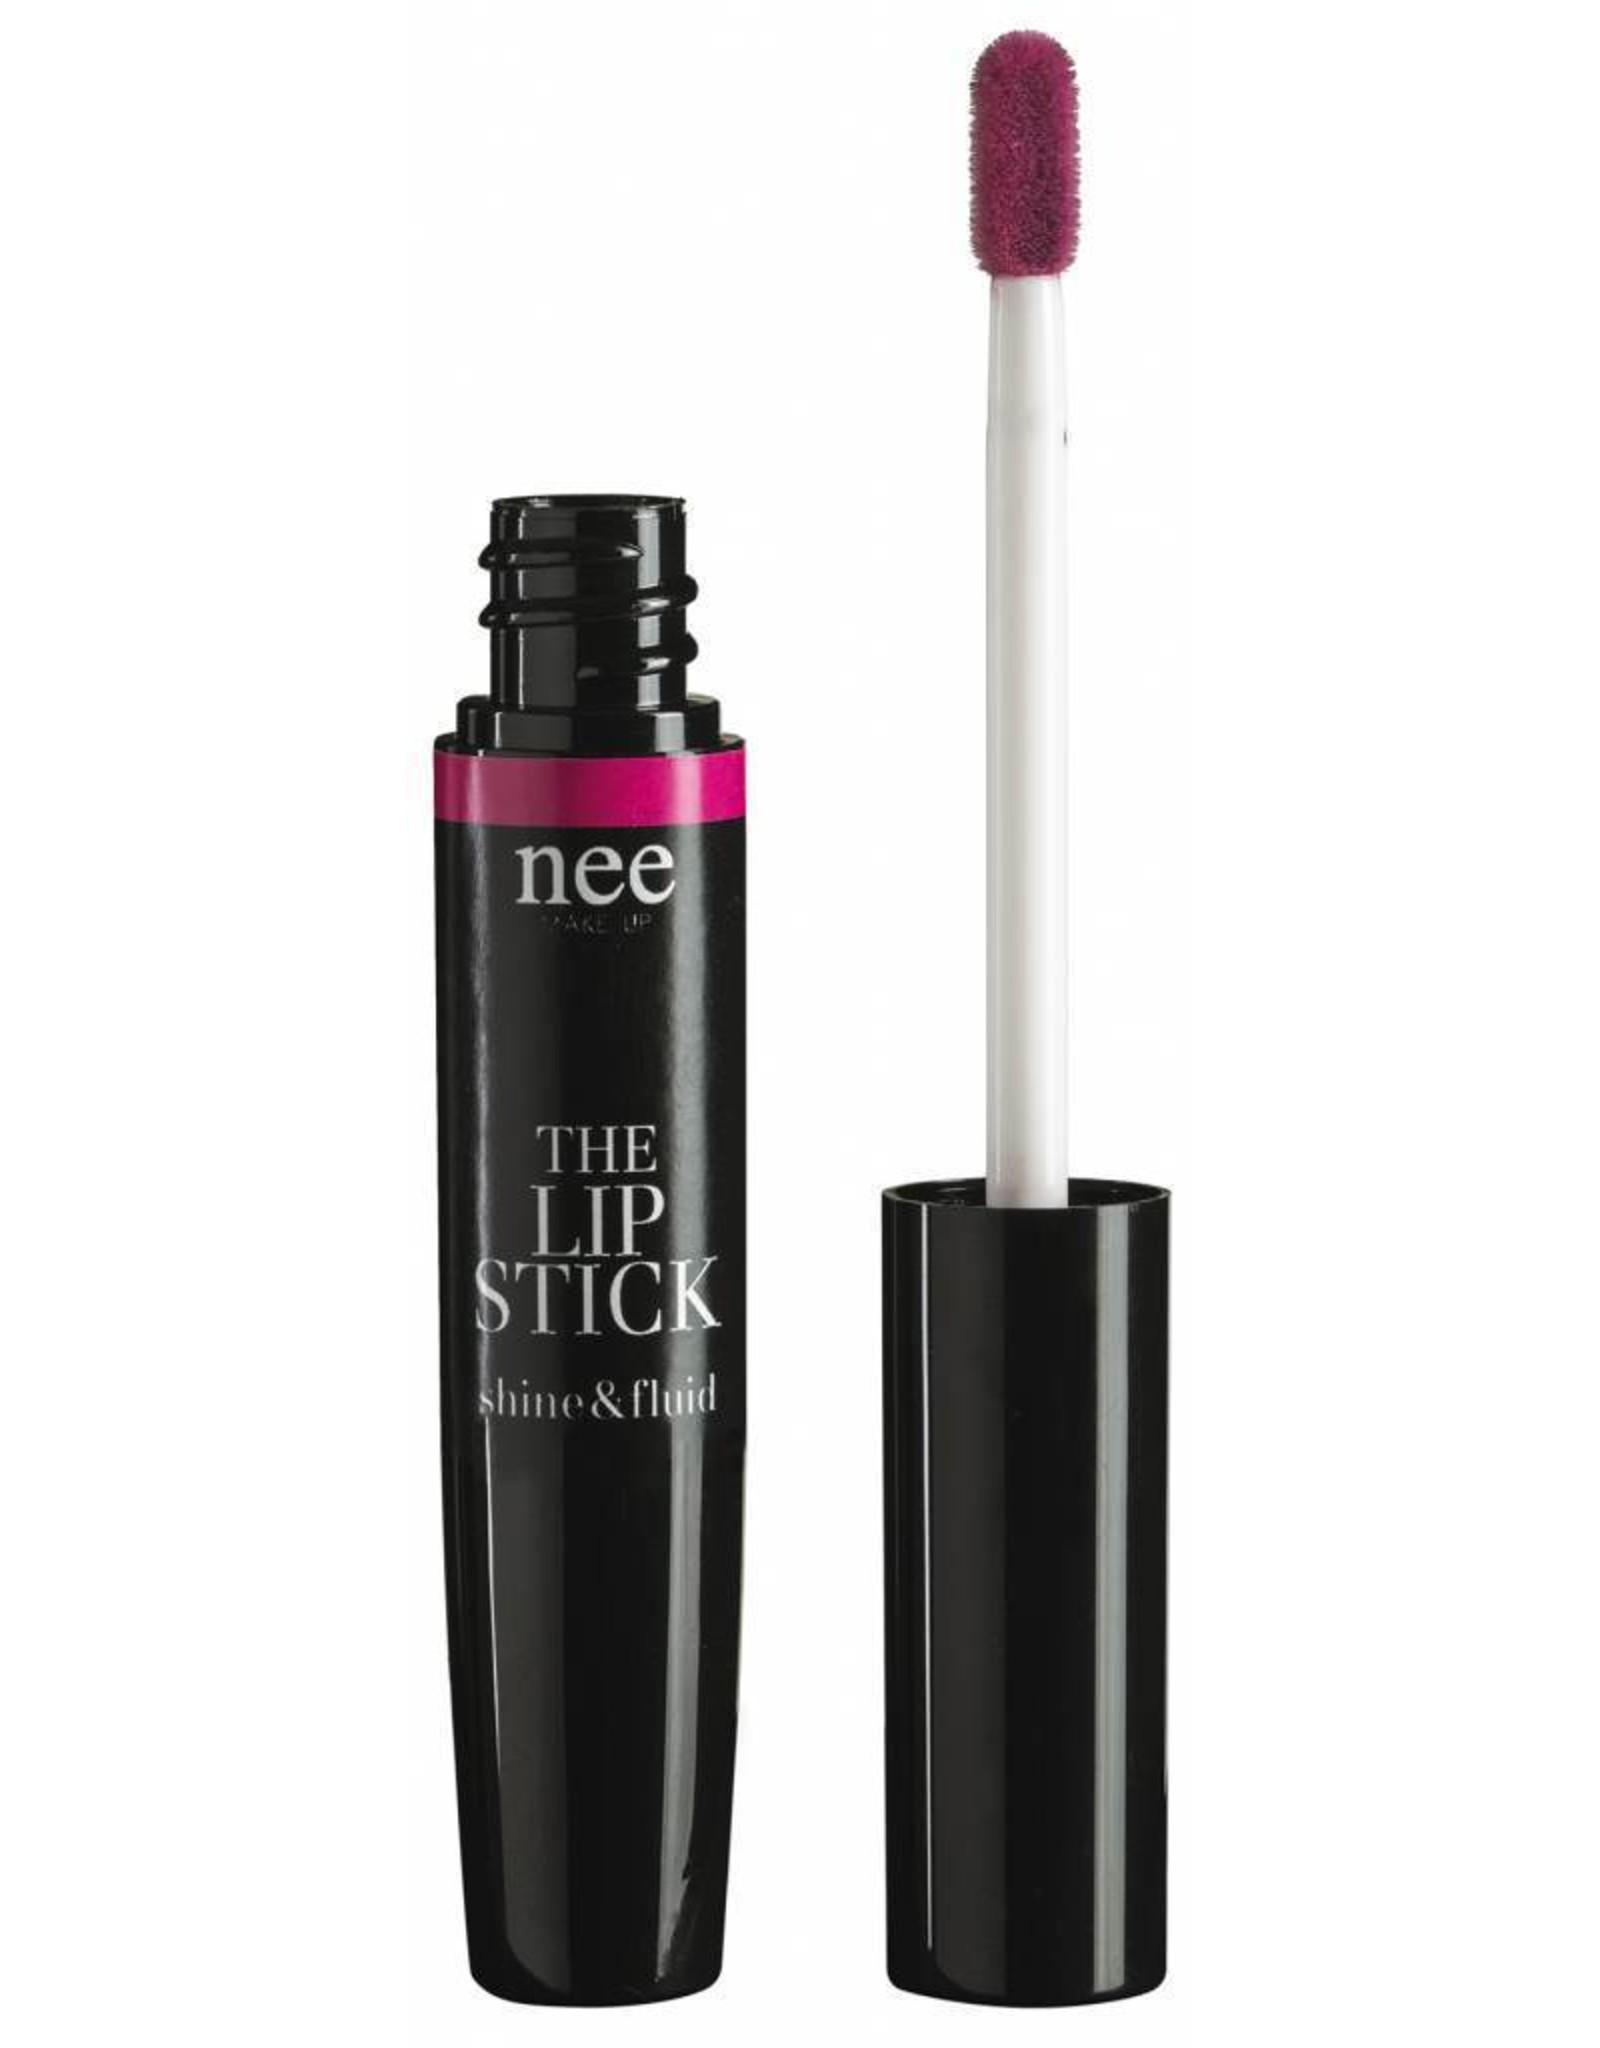 Nee Make-up Shine & Fluid Lipstick